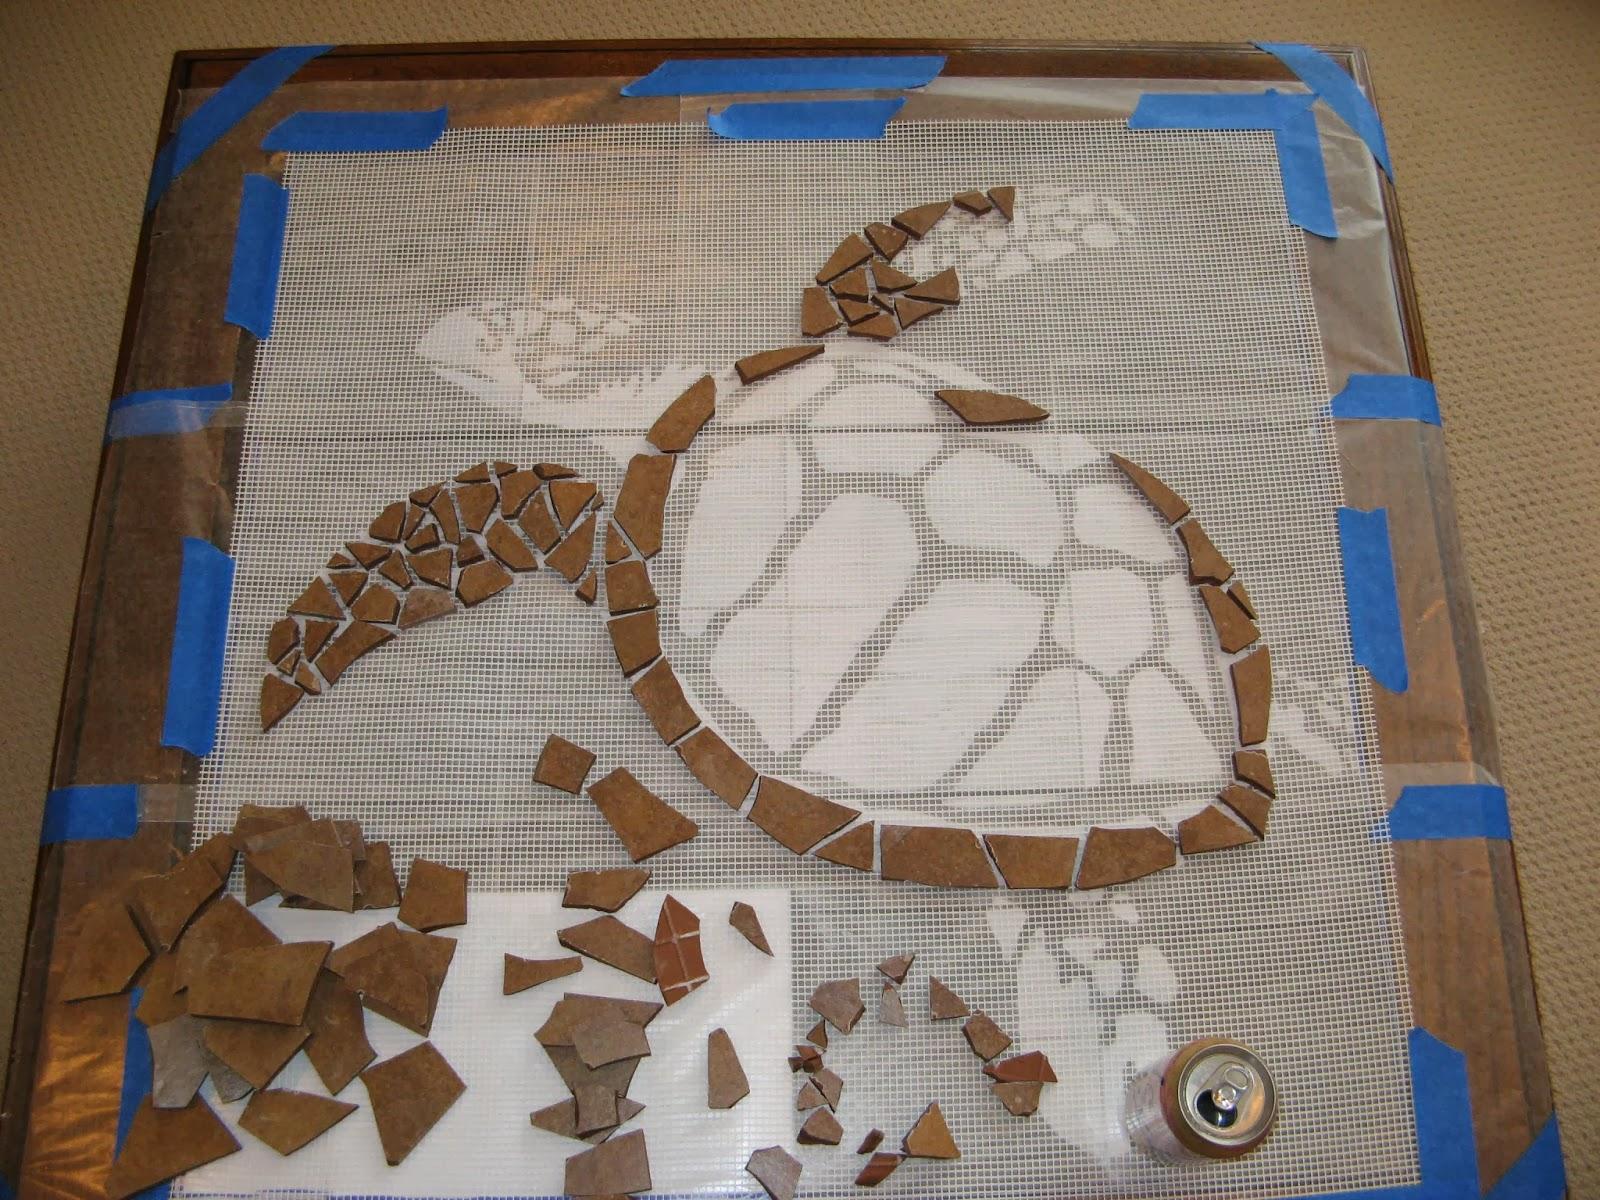 Turtle Mosaic - Broken Ceramic Tiles